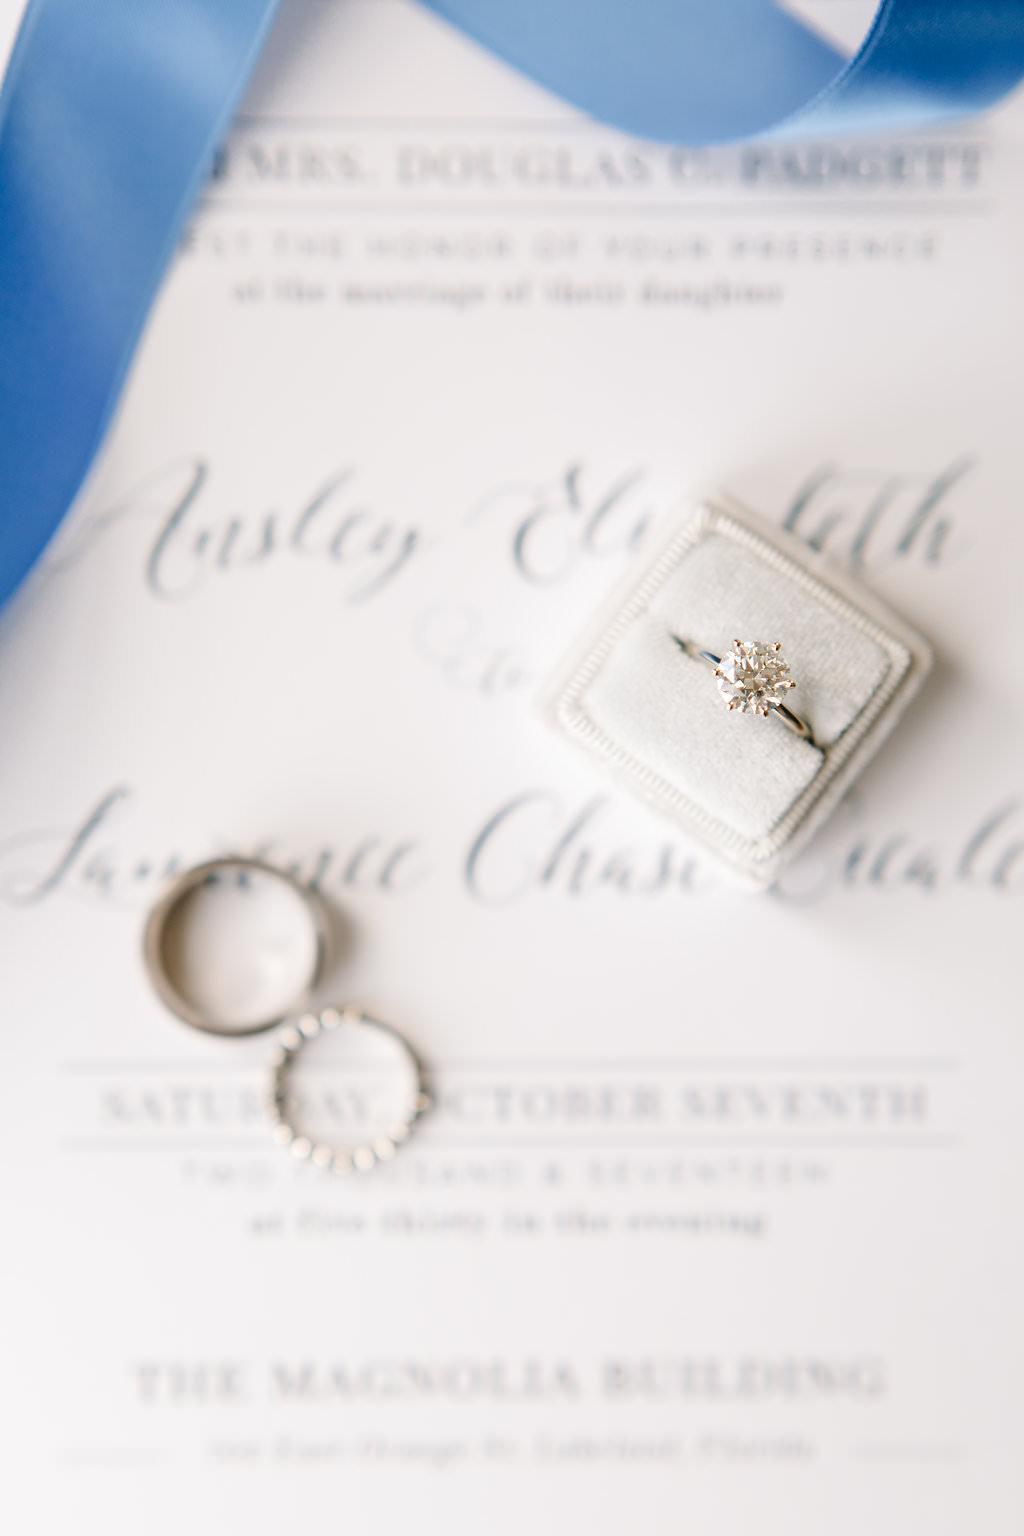 Round Diamond Engagement Ring in Grey Velvet Ring Box on Wedding Invitation